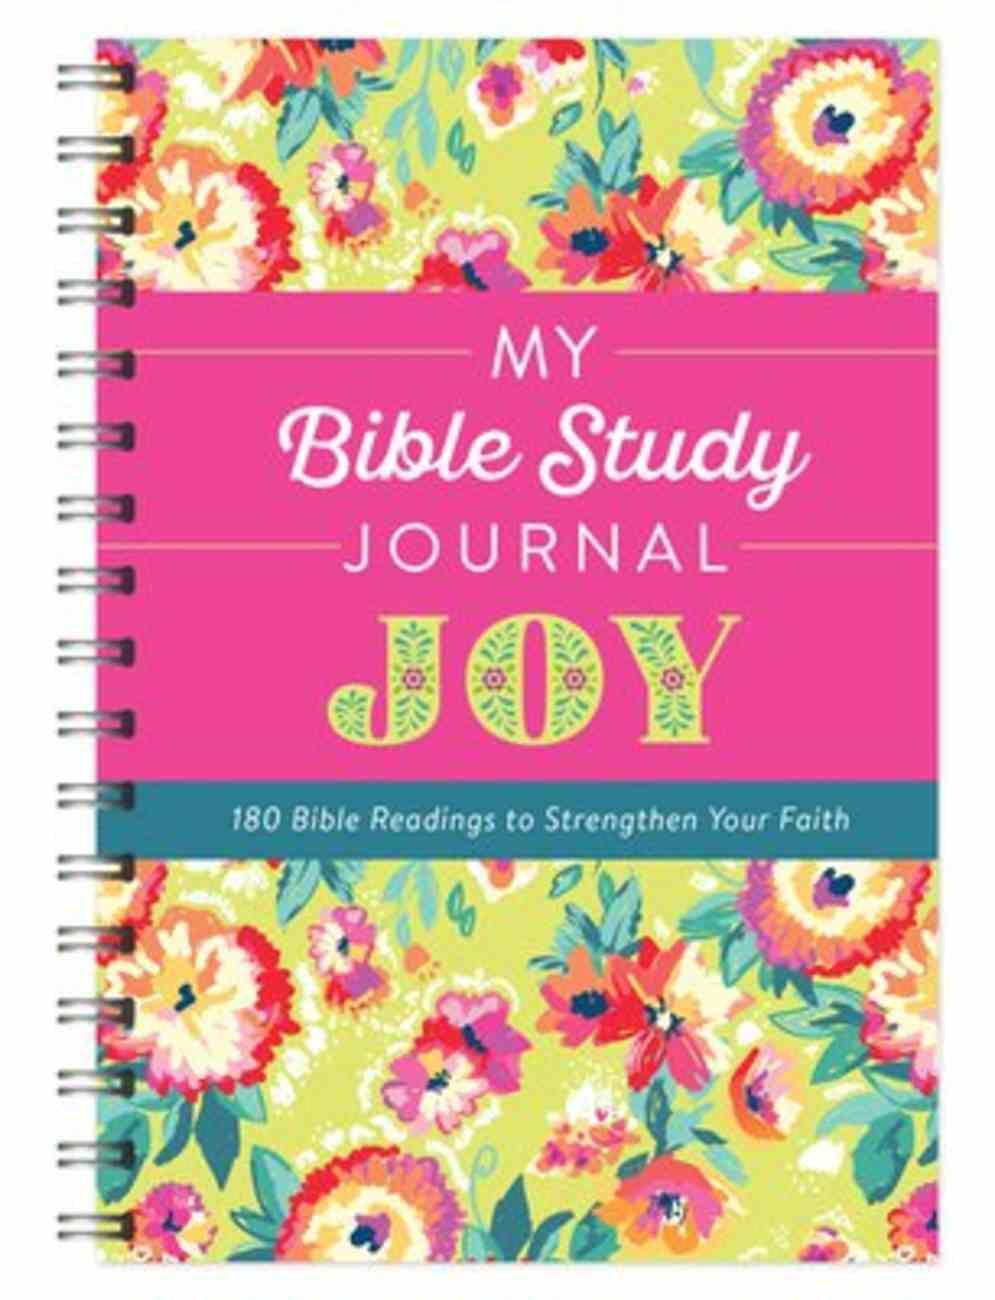 My Bible Study Journal: Joy Spiral